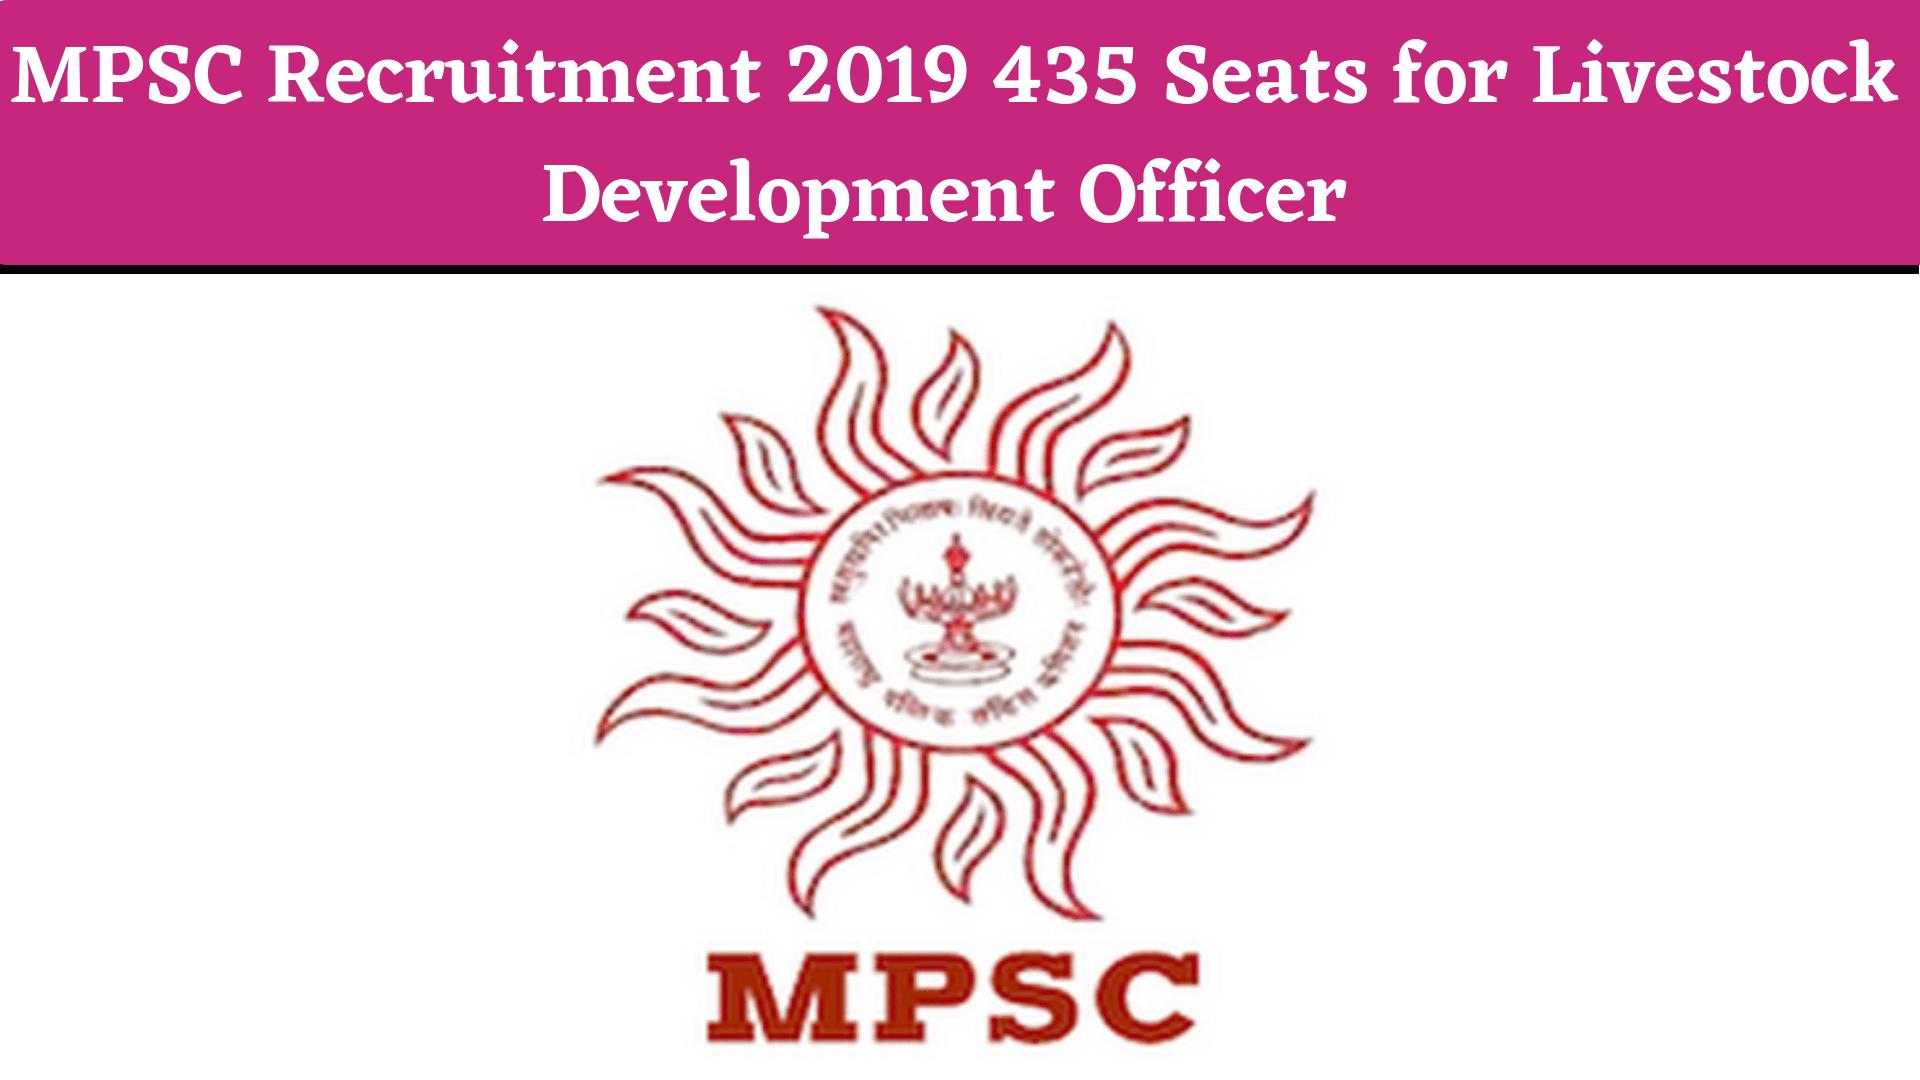 MPSC Recruitment 2019 435 Seats for Livestock Development Officer